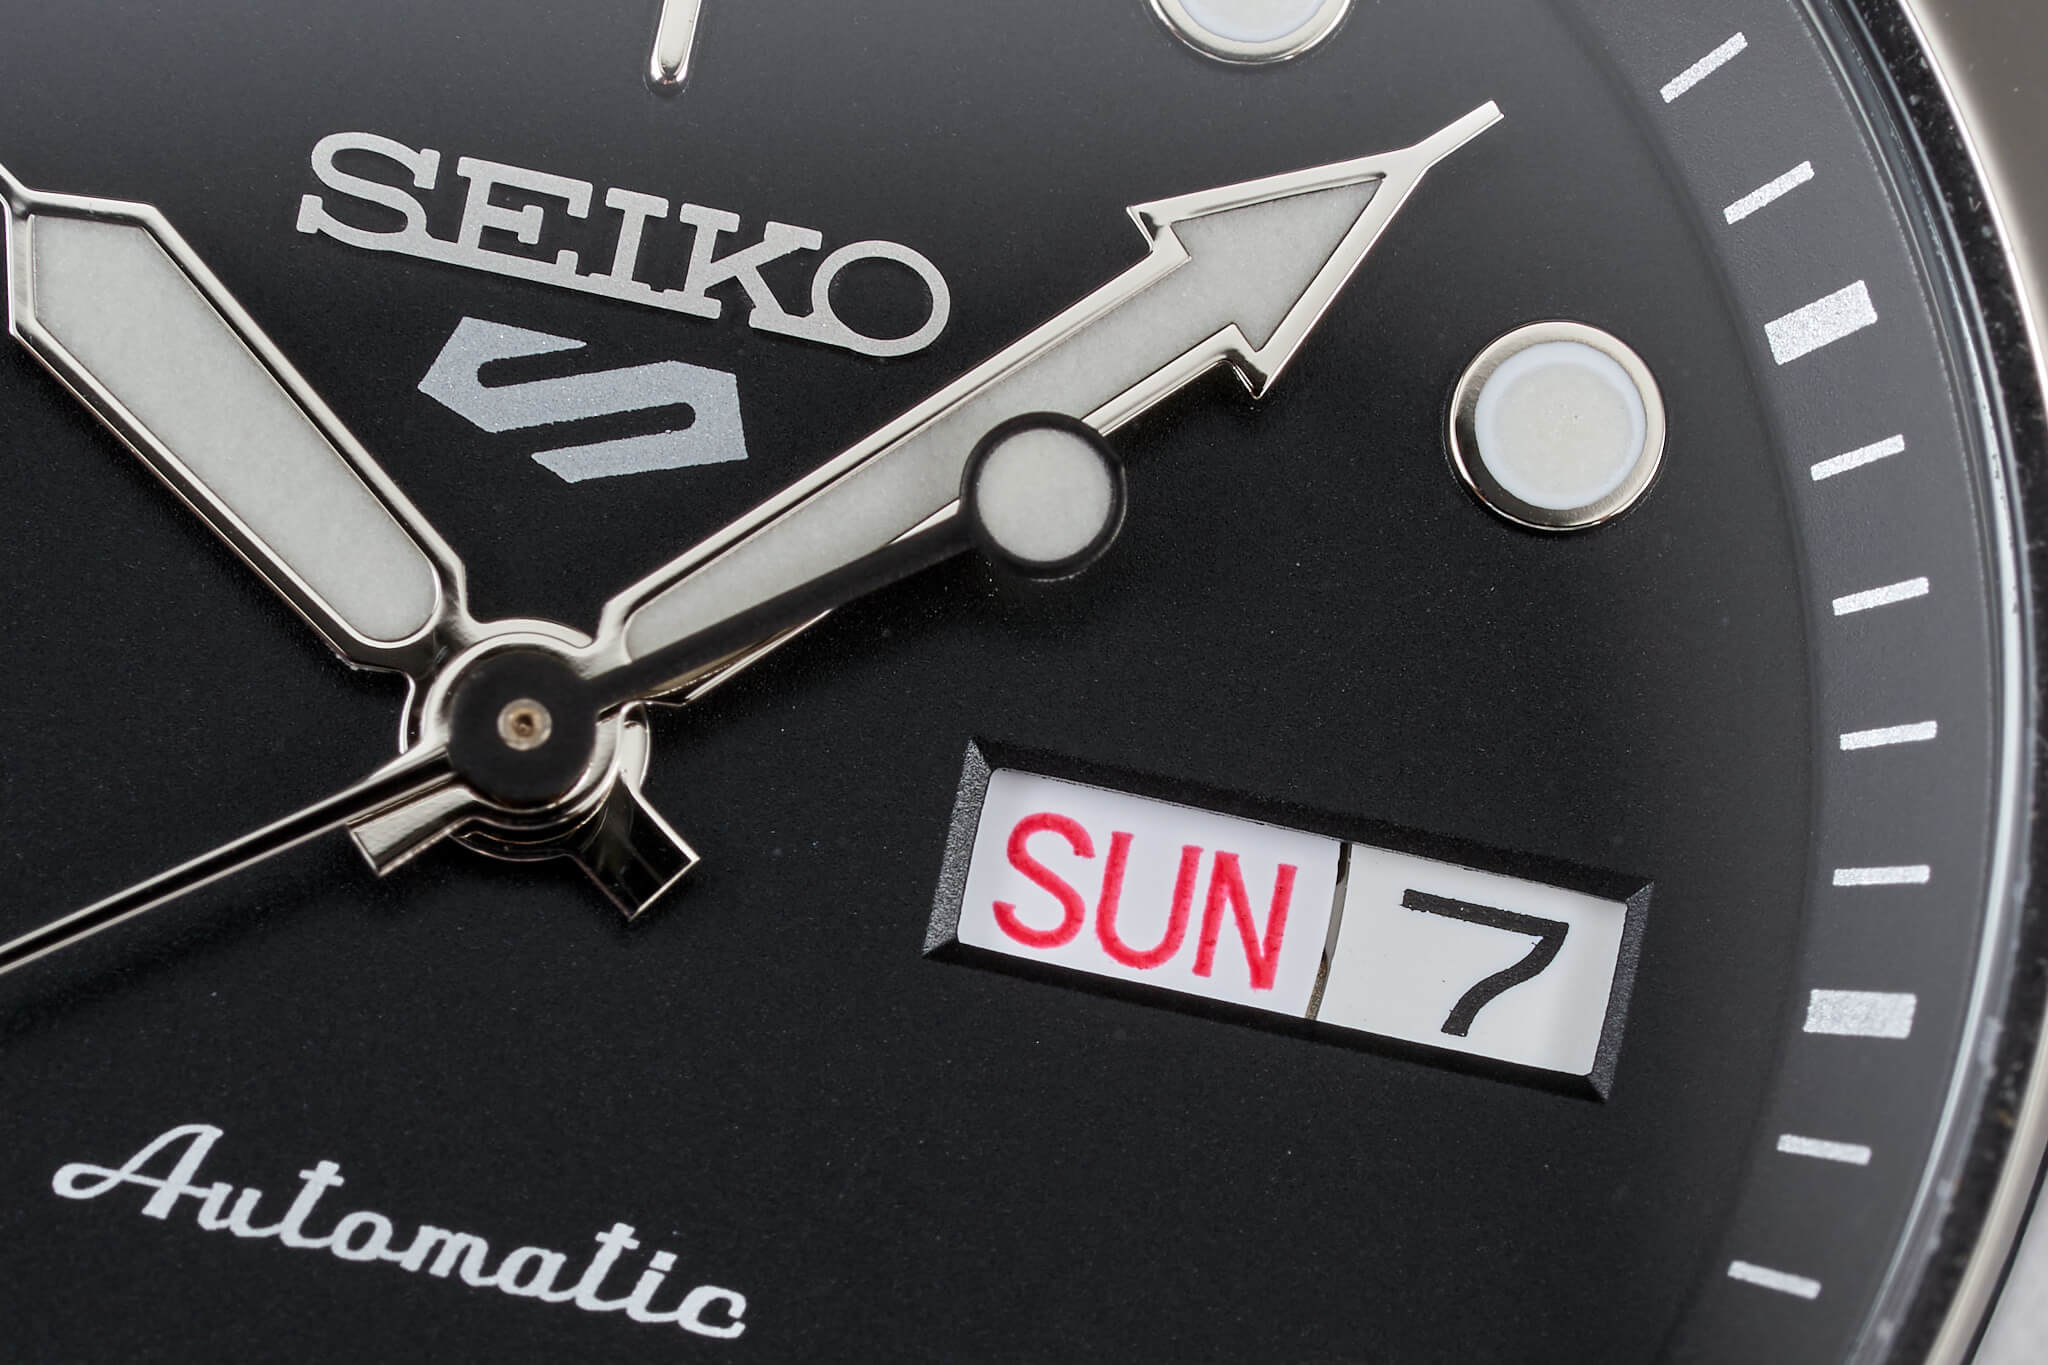 Seiko-5-Fixed-Bezel-SRPE55-SRPE51-SRPE53-SRPE57-3-1